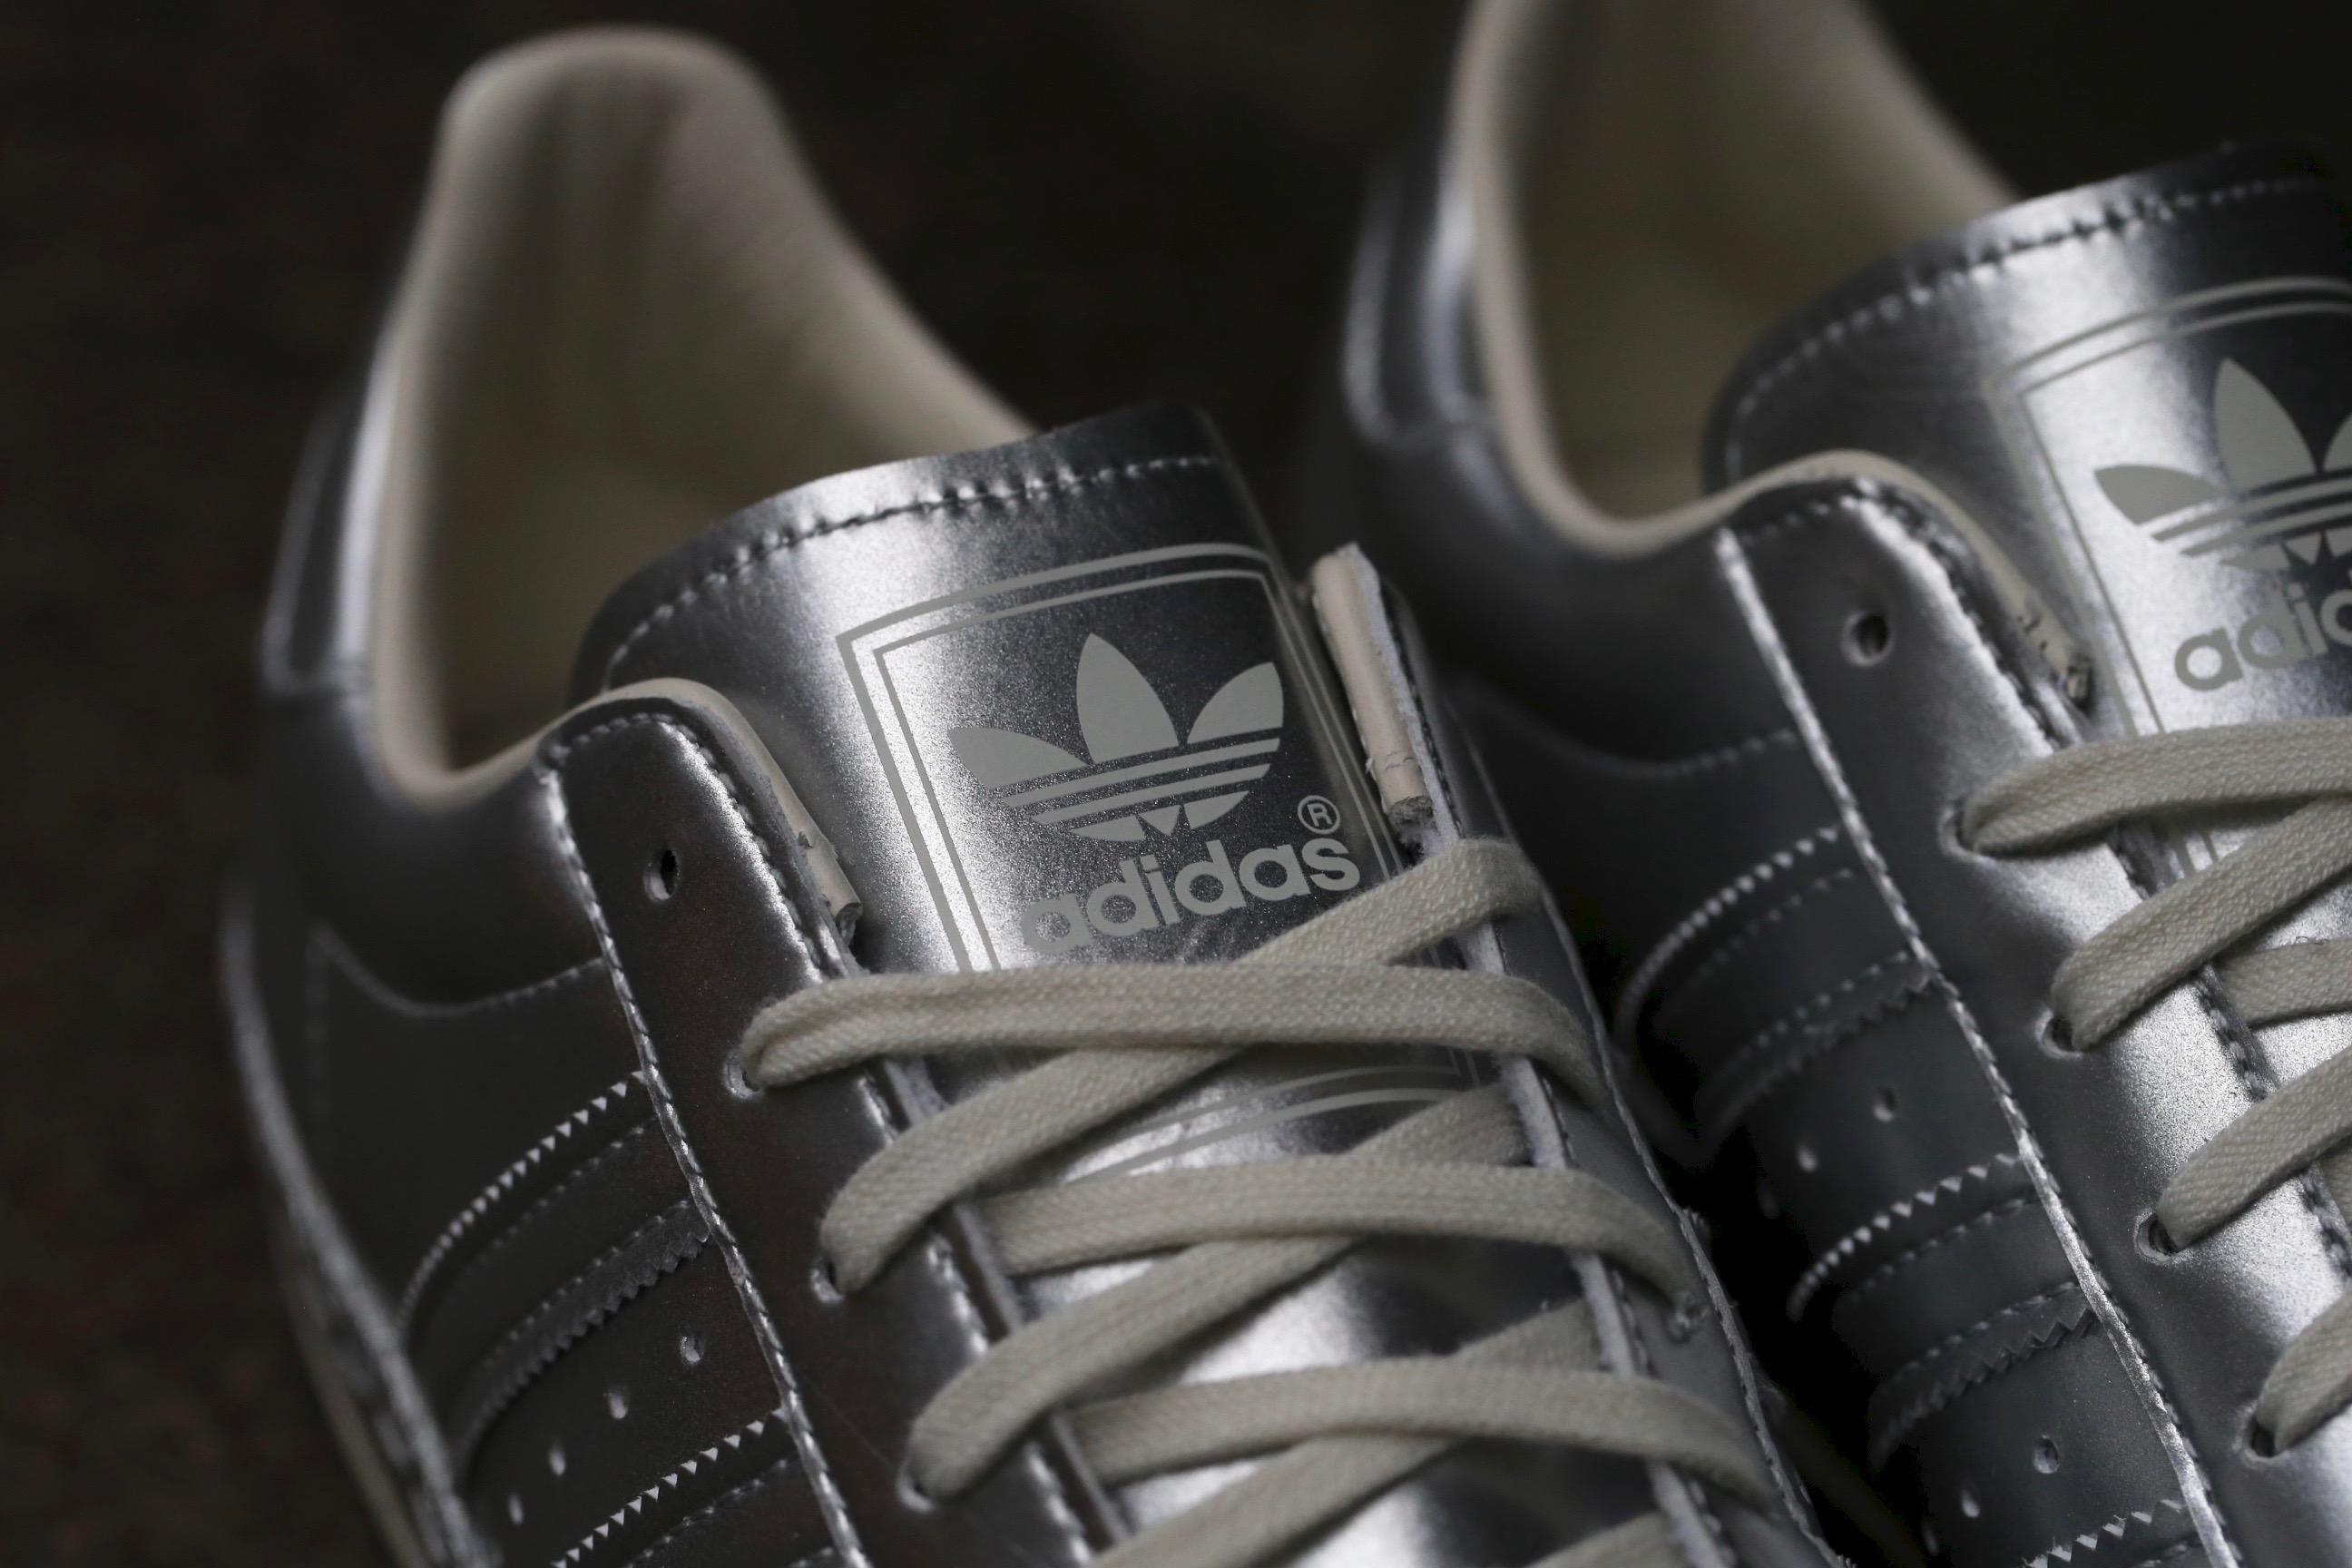 a709cbea7d5817 adidas superstar damen metallic silber Verkauf-Kostenlose Lieferung!